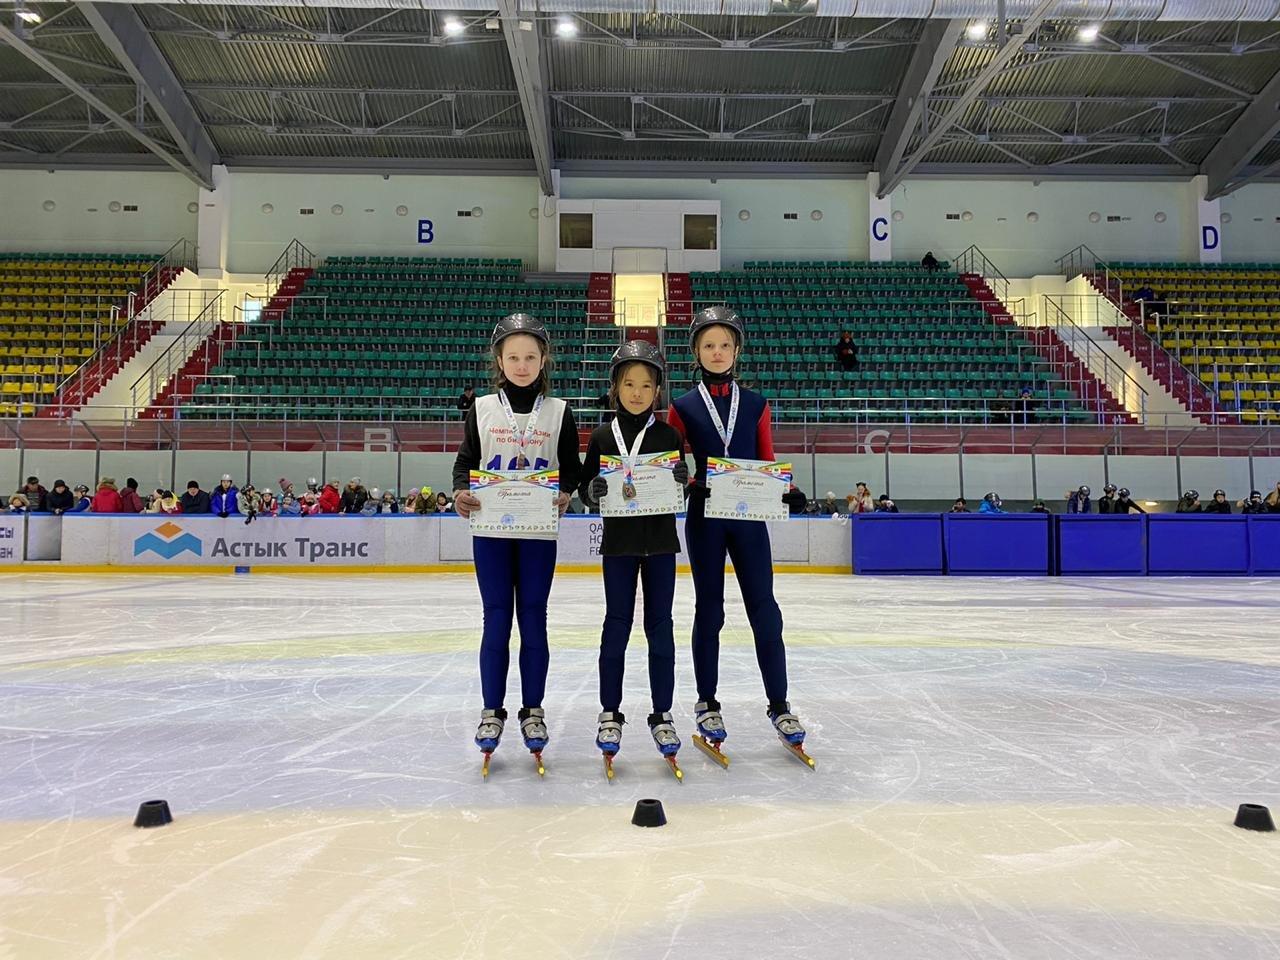 Чемпионат по жиму лёжа прошёл в Акмолинской области (фото), фото-9